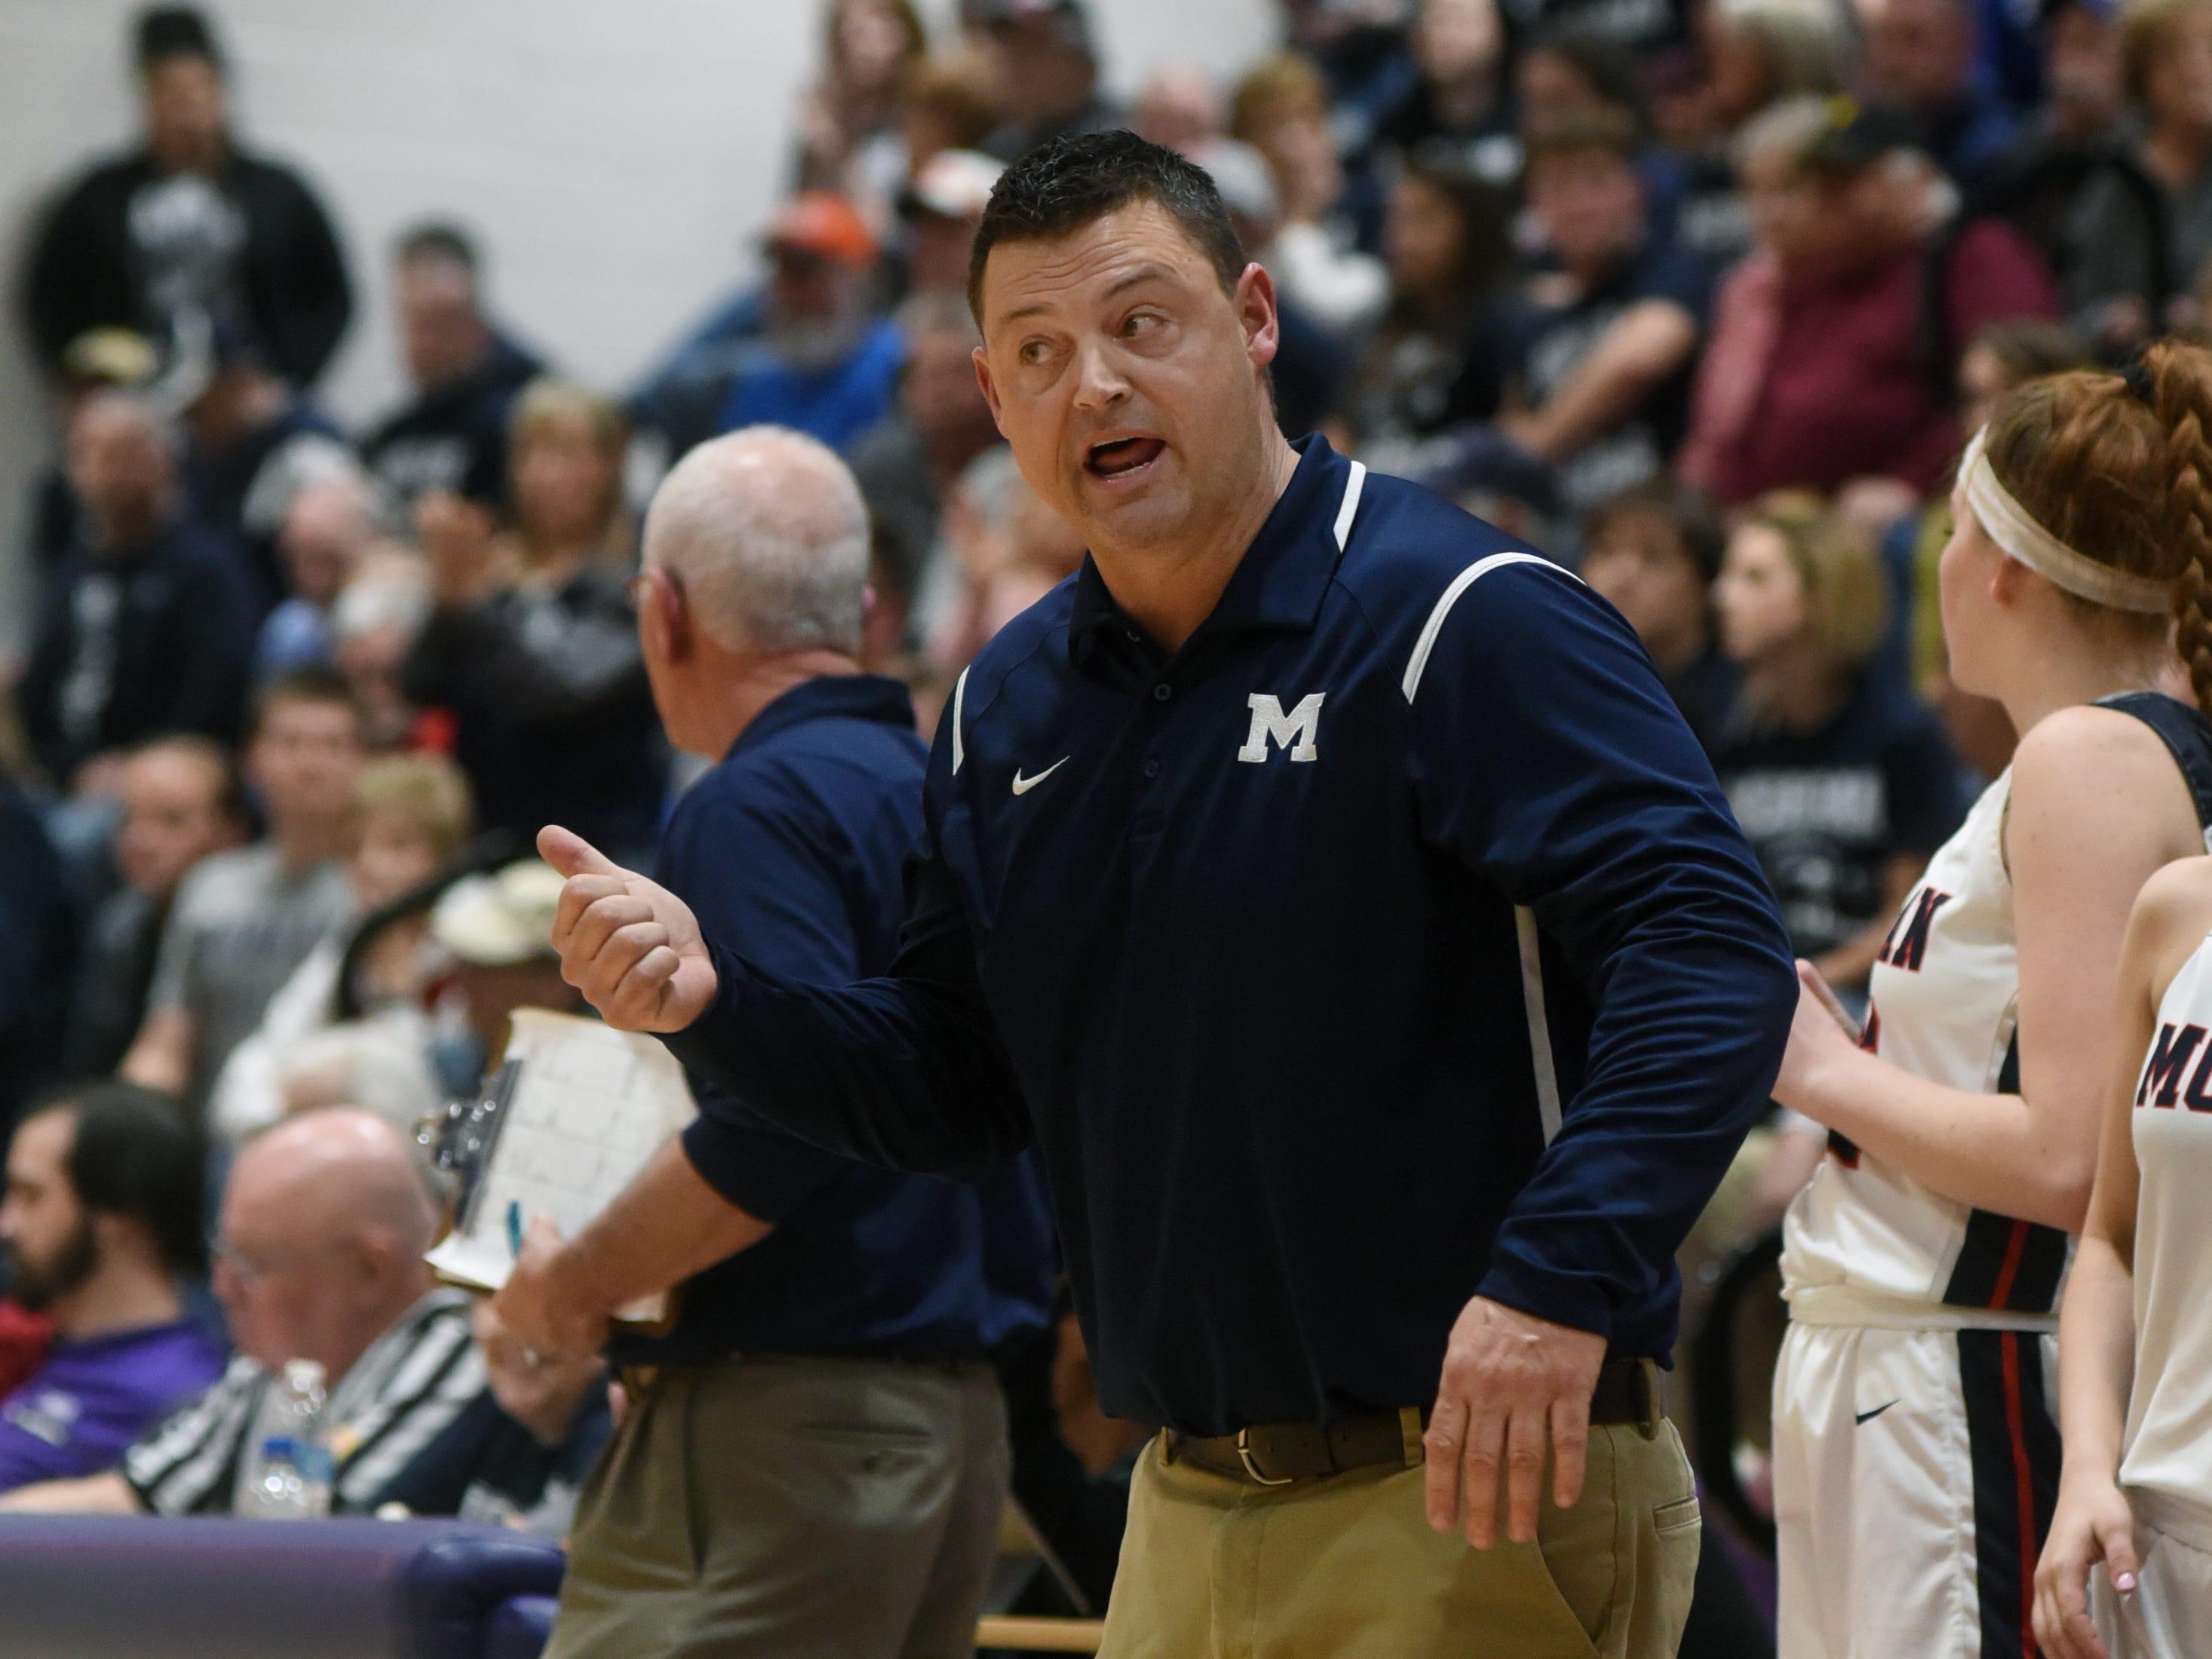 Coach Matt Zumbro talks to his team during the fourth quarter of Morgan's 56-55 loss to Wheelersburg in a Division III regional semifinal at Logan.